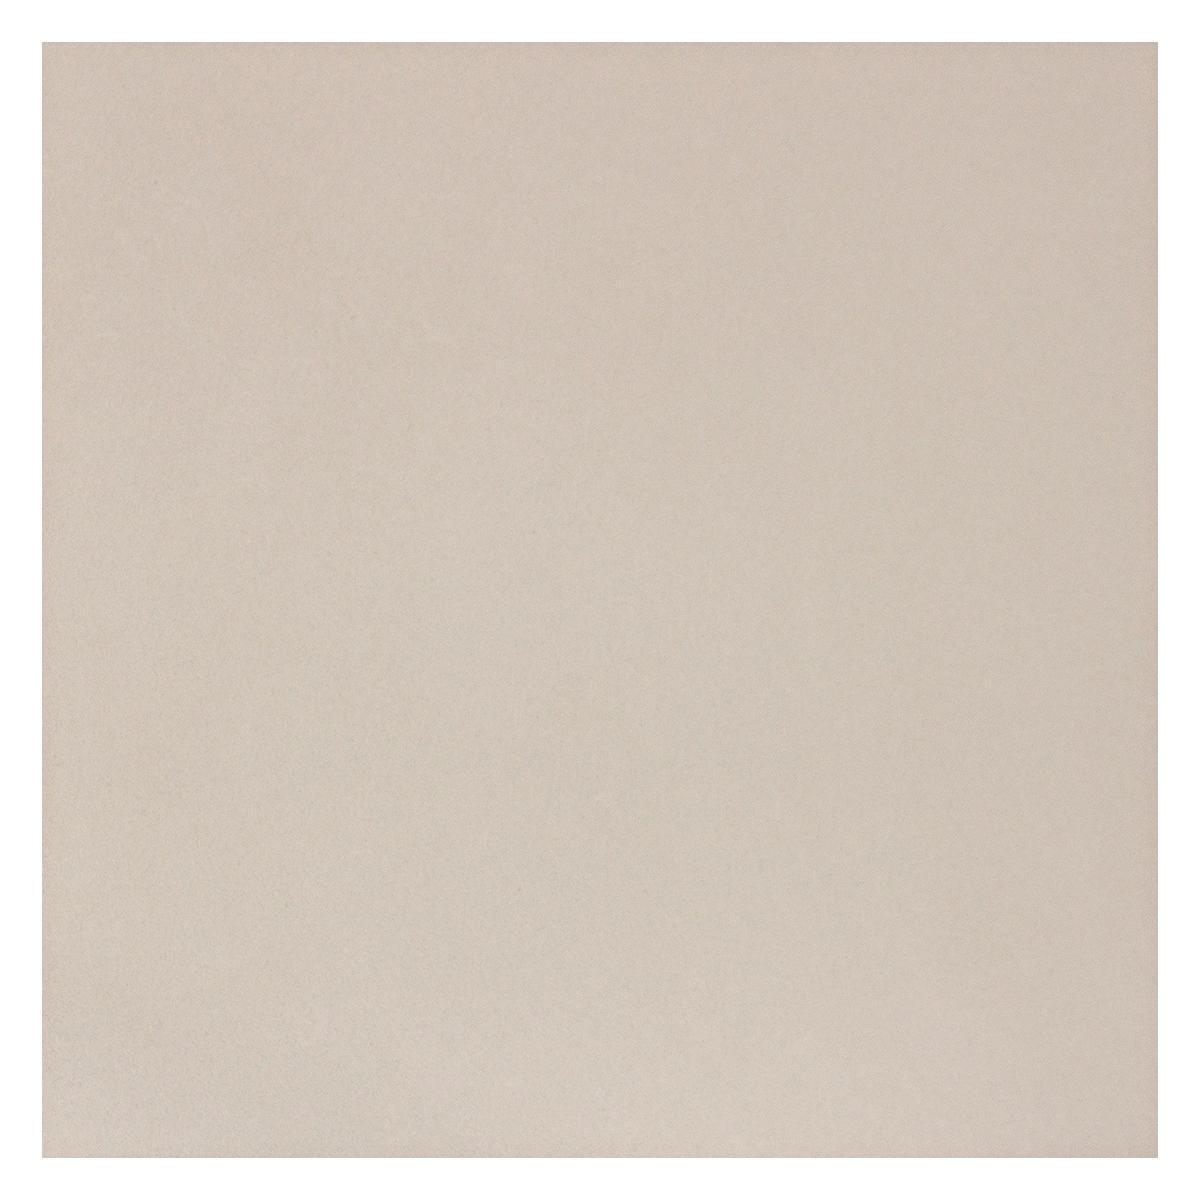 Porcelanato Unicolor Beige Brillante - 60X60 cm - 1.44 m2